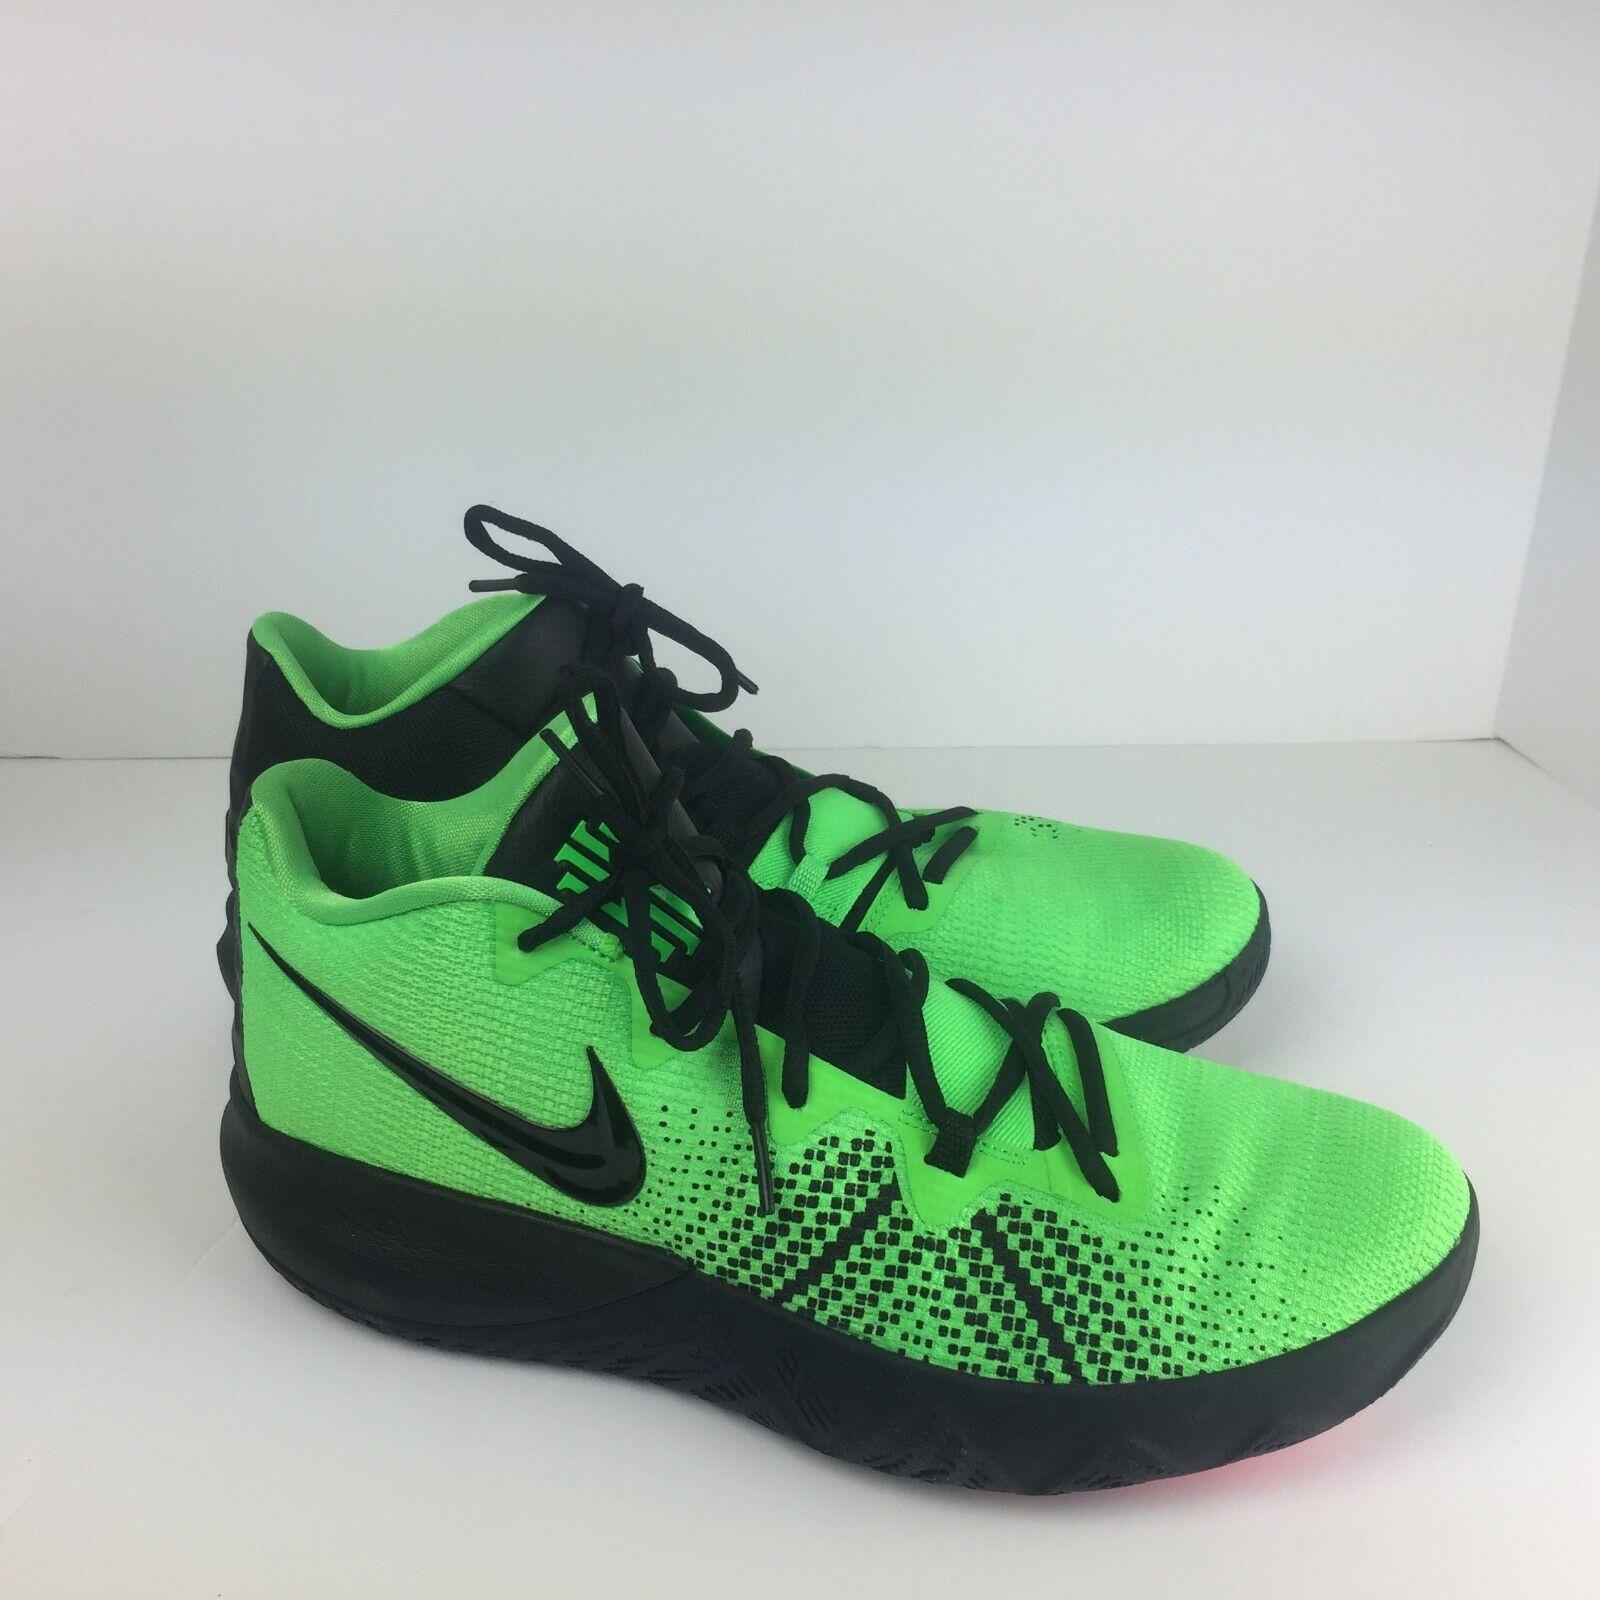 74f7979dd67d Nike Kyrie Flytrap shoes Men s Basketball Sneakers Rage Rage Rage Green  AA7071-300 a79793